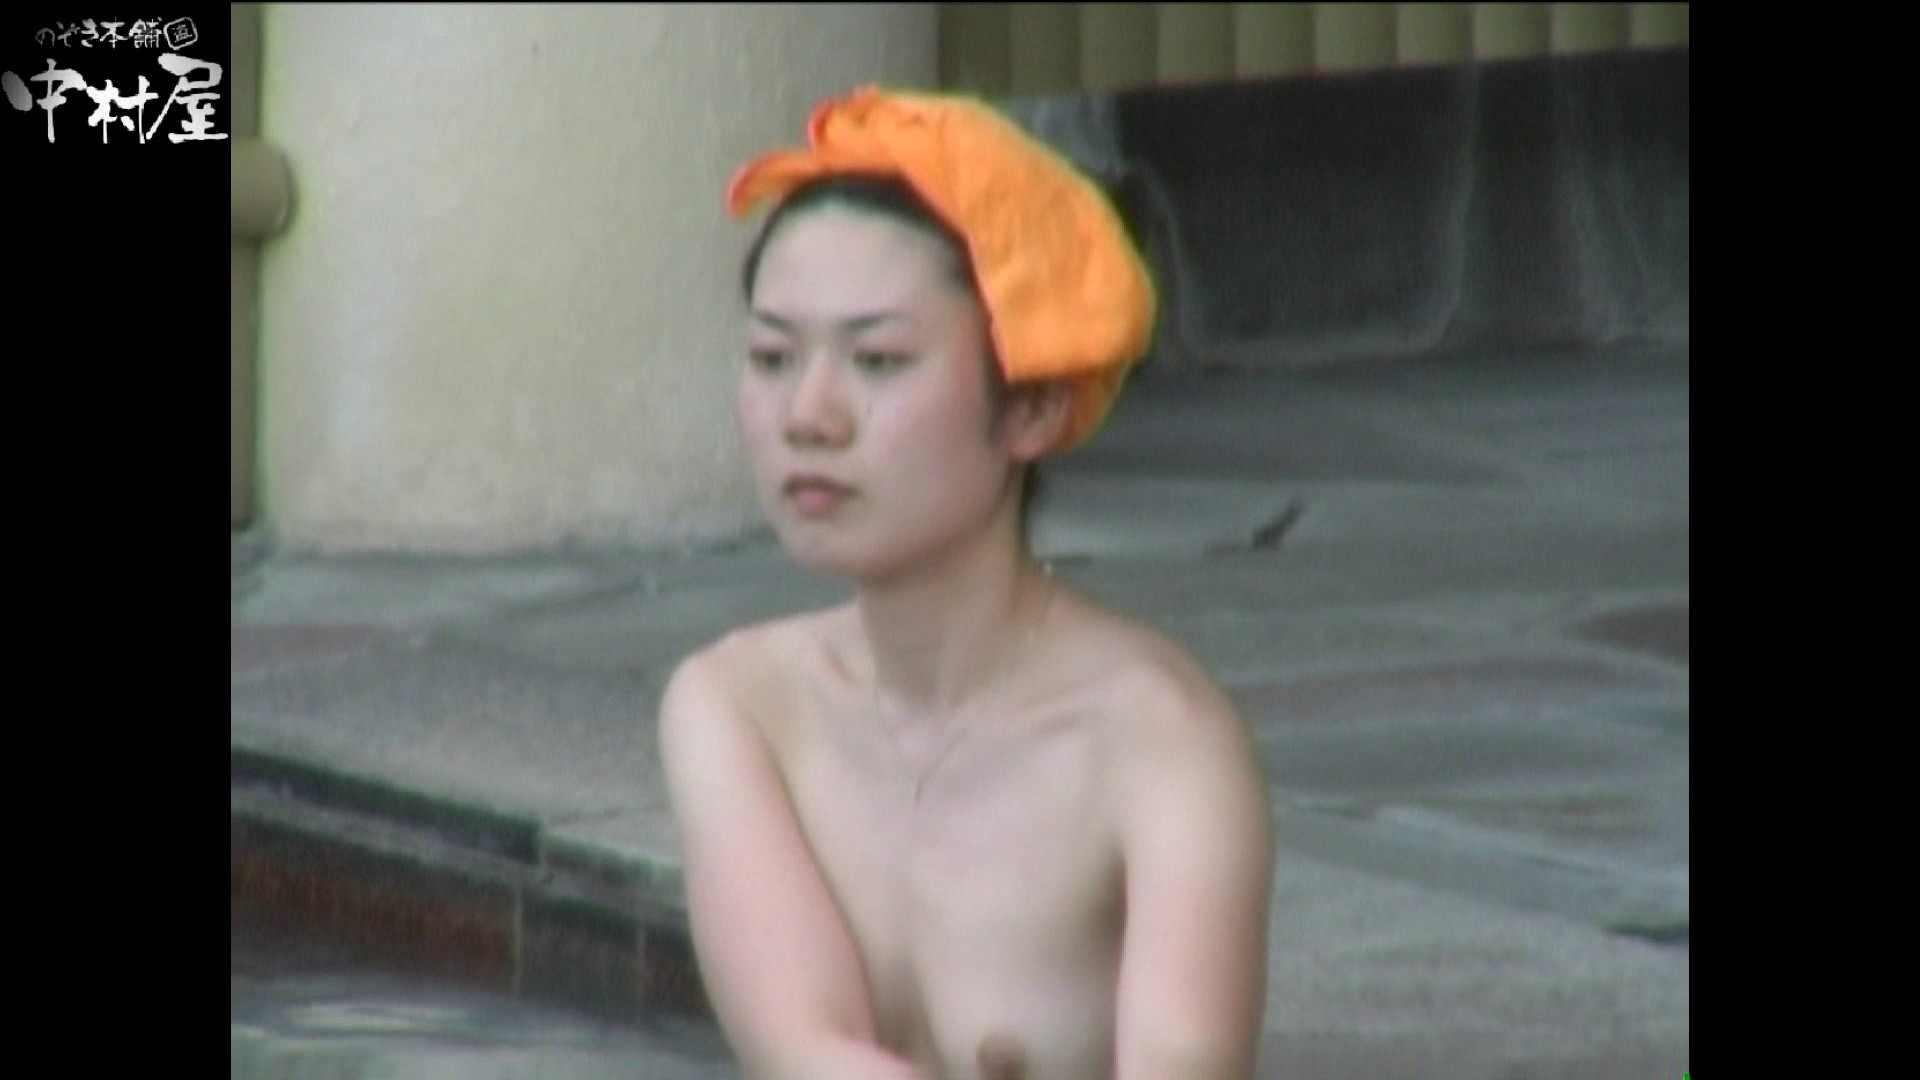 Aquaな露天風呂Vol.978 OLセックス  77画像 75